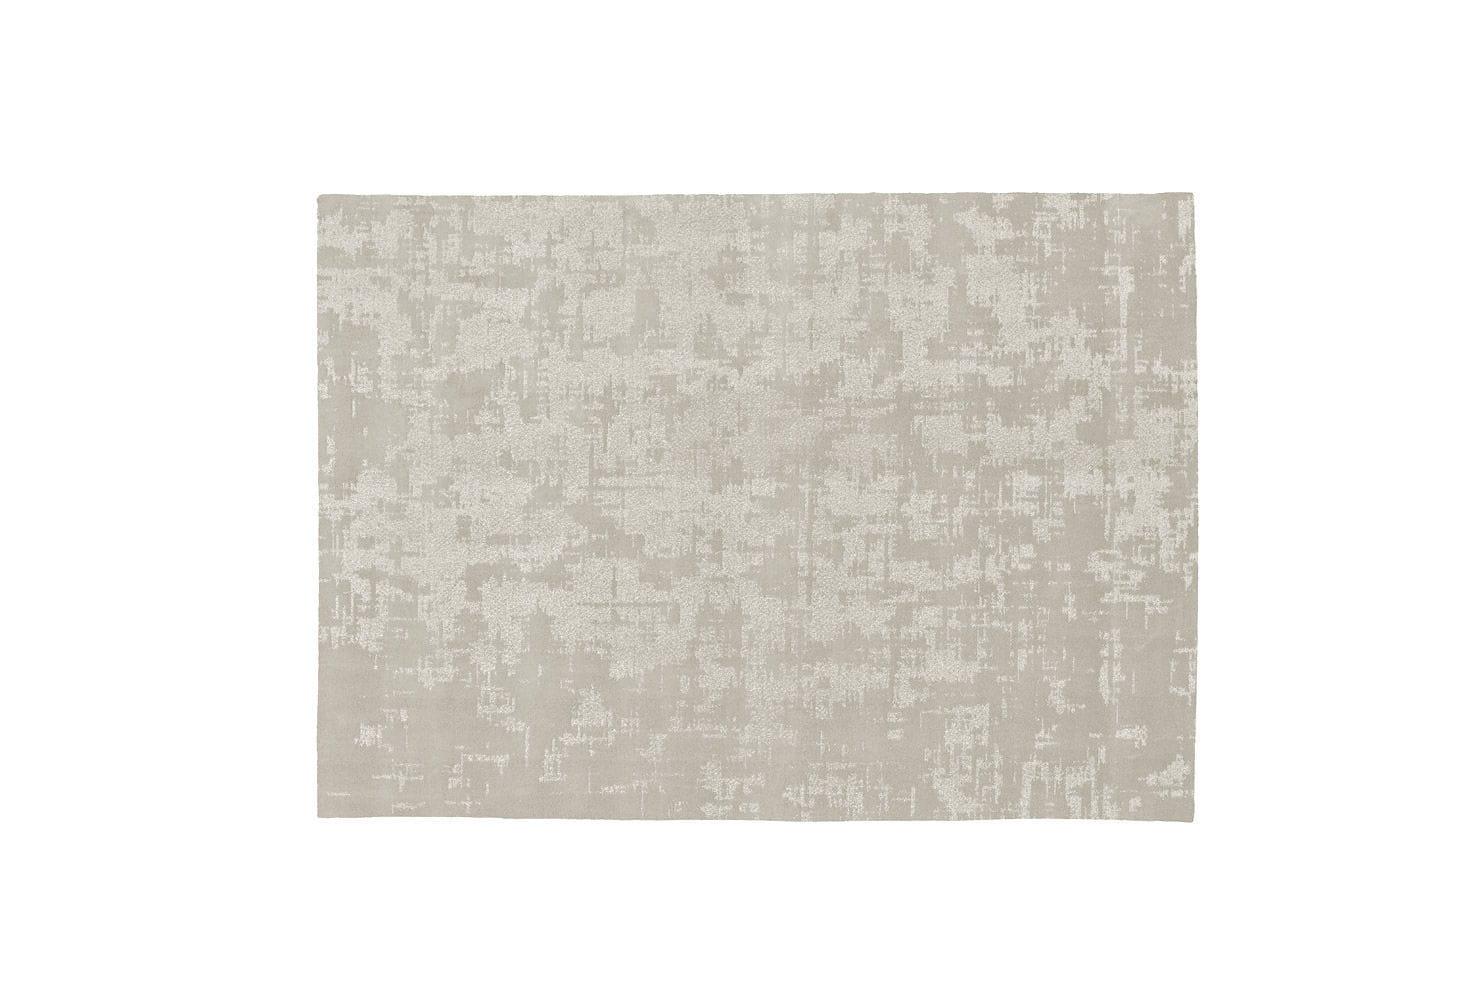 ... Contemporary Rug / Patterned / Silk / Rectangular ISTOS By Francesca  Simen Bu0026B Italia ...